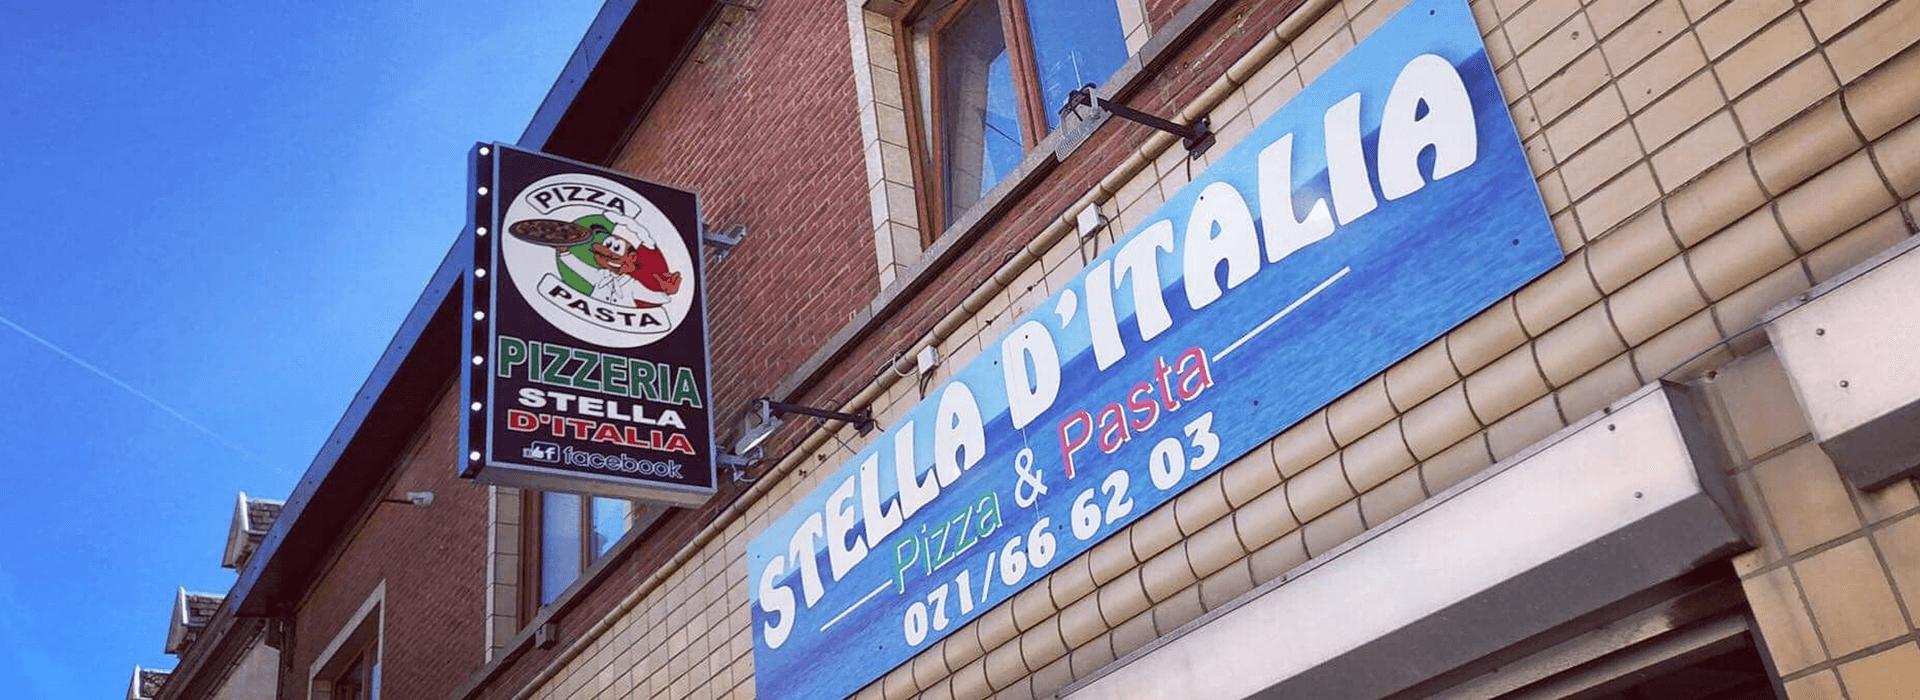 slider1-stelladitalia- Hainaut